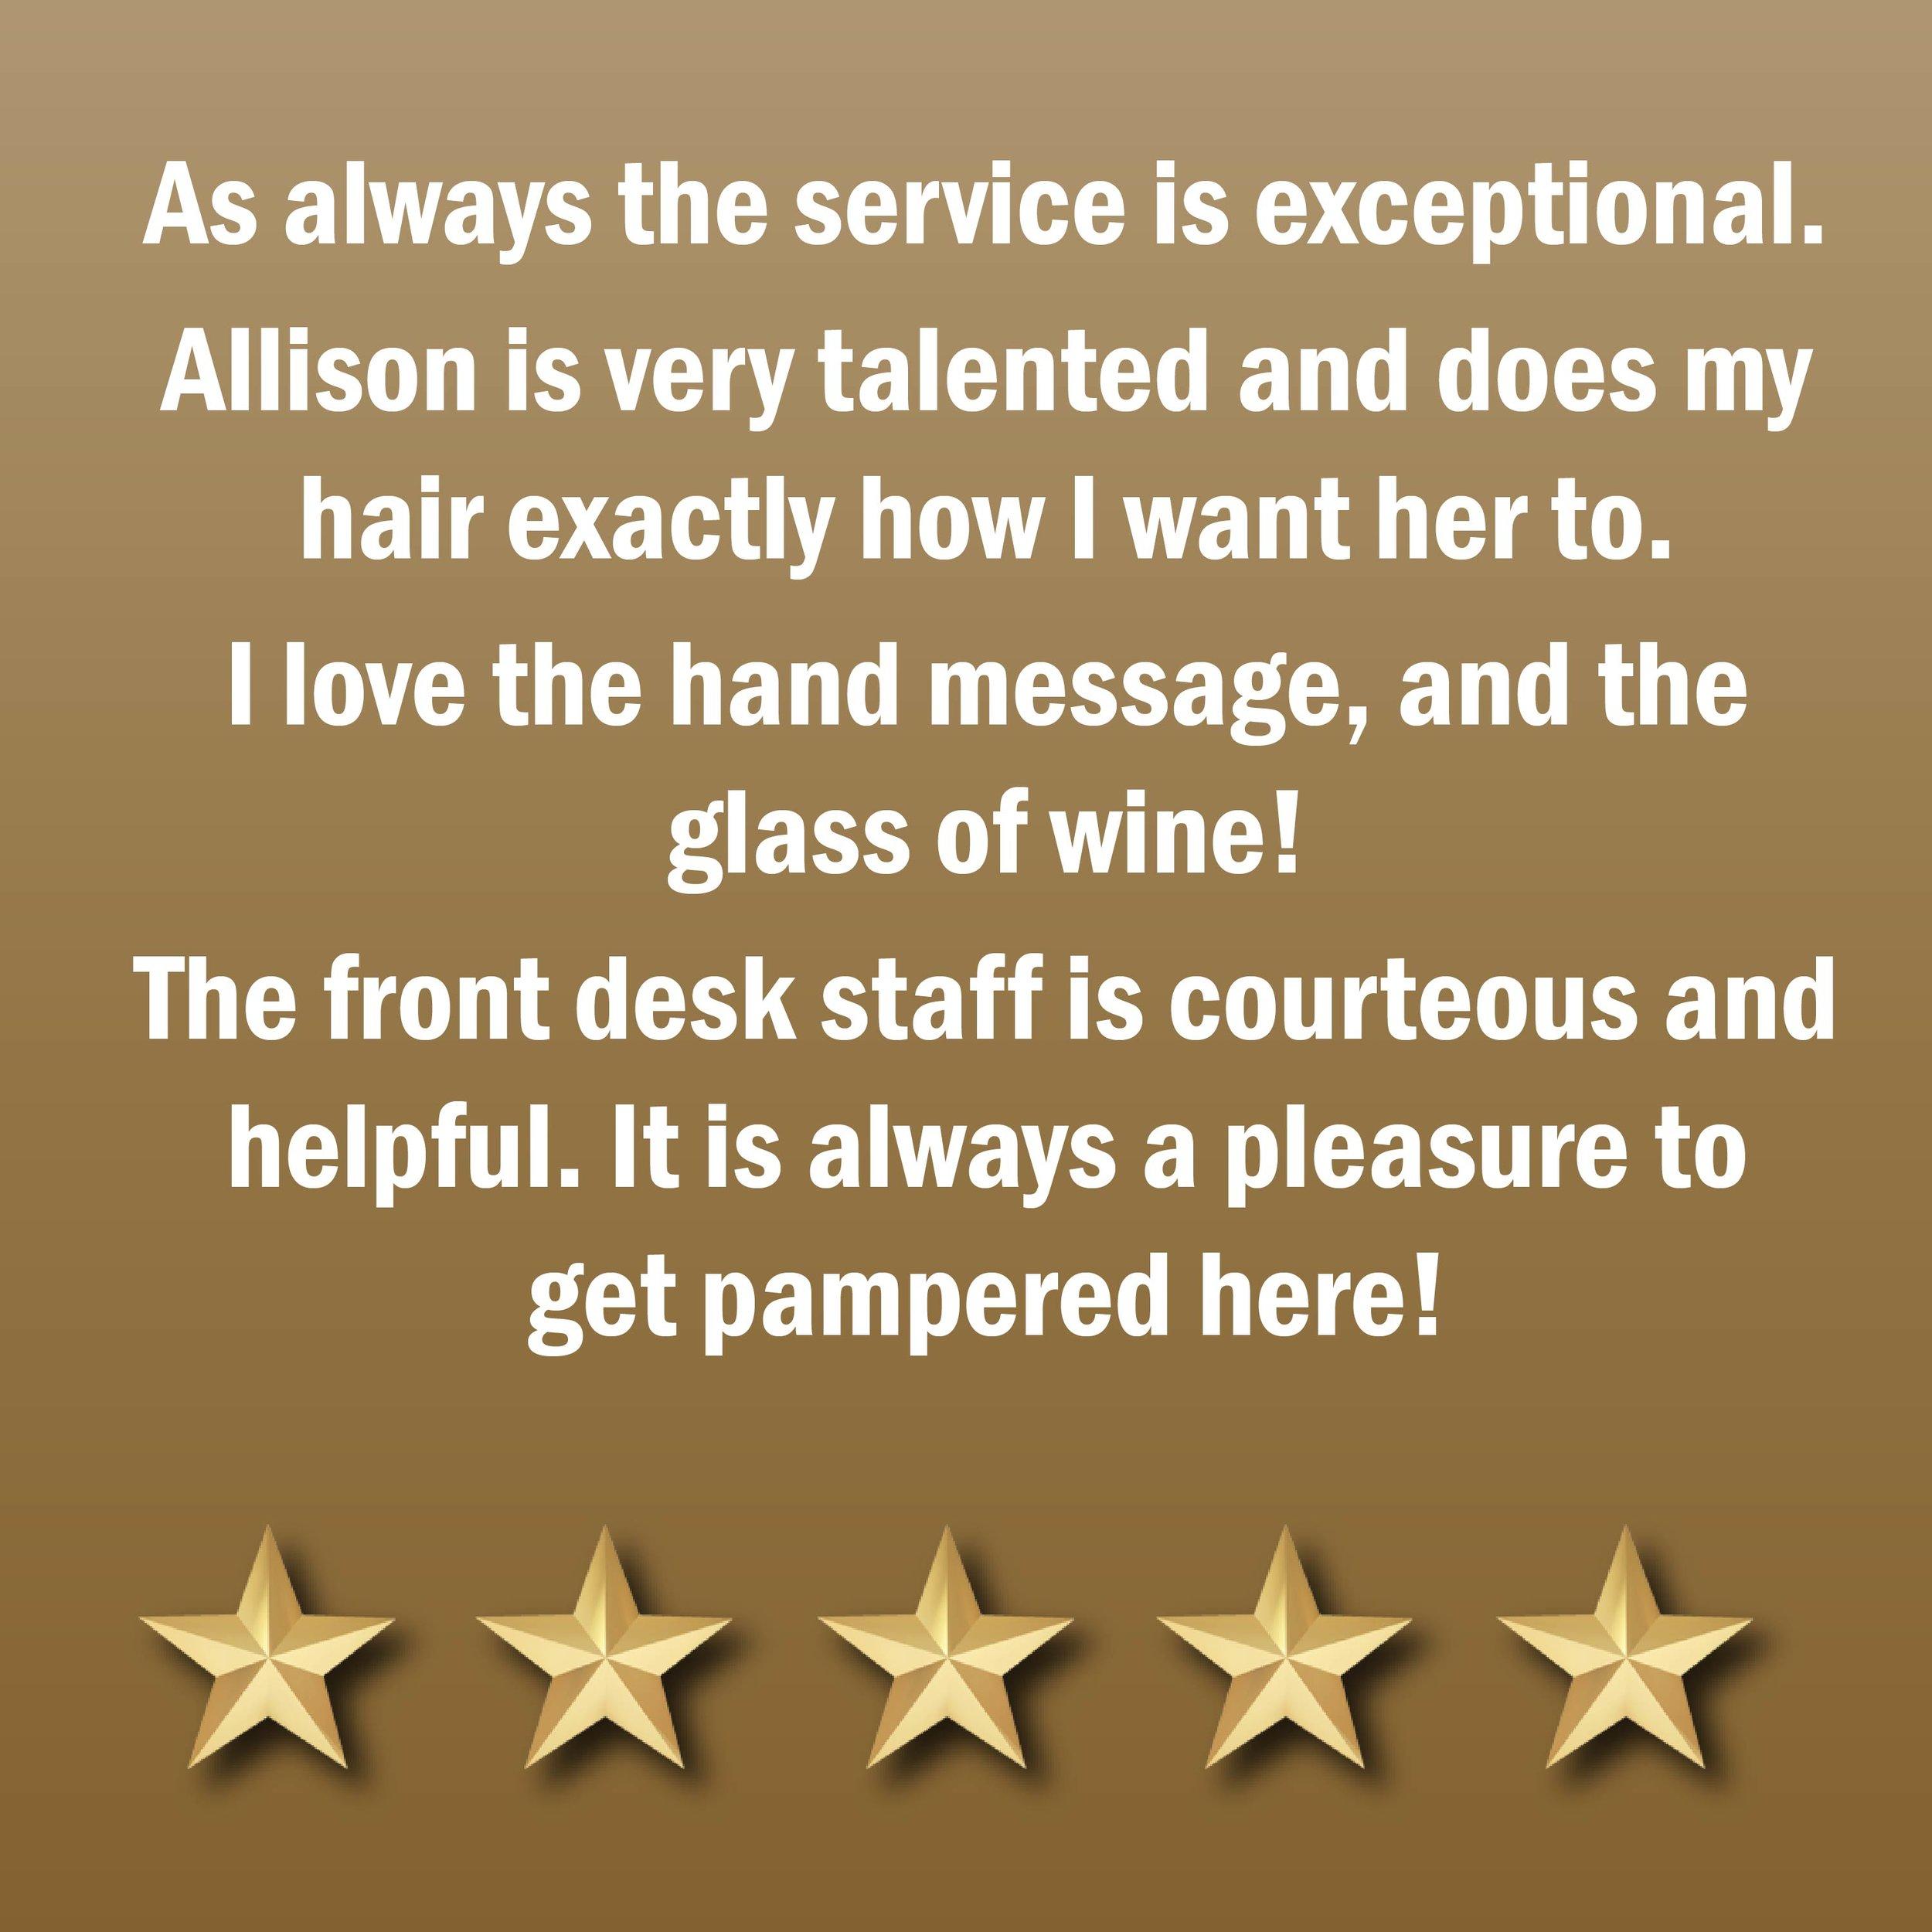 Allison Review4-01.jpg